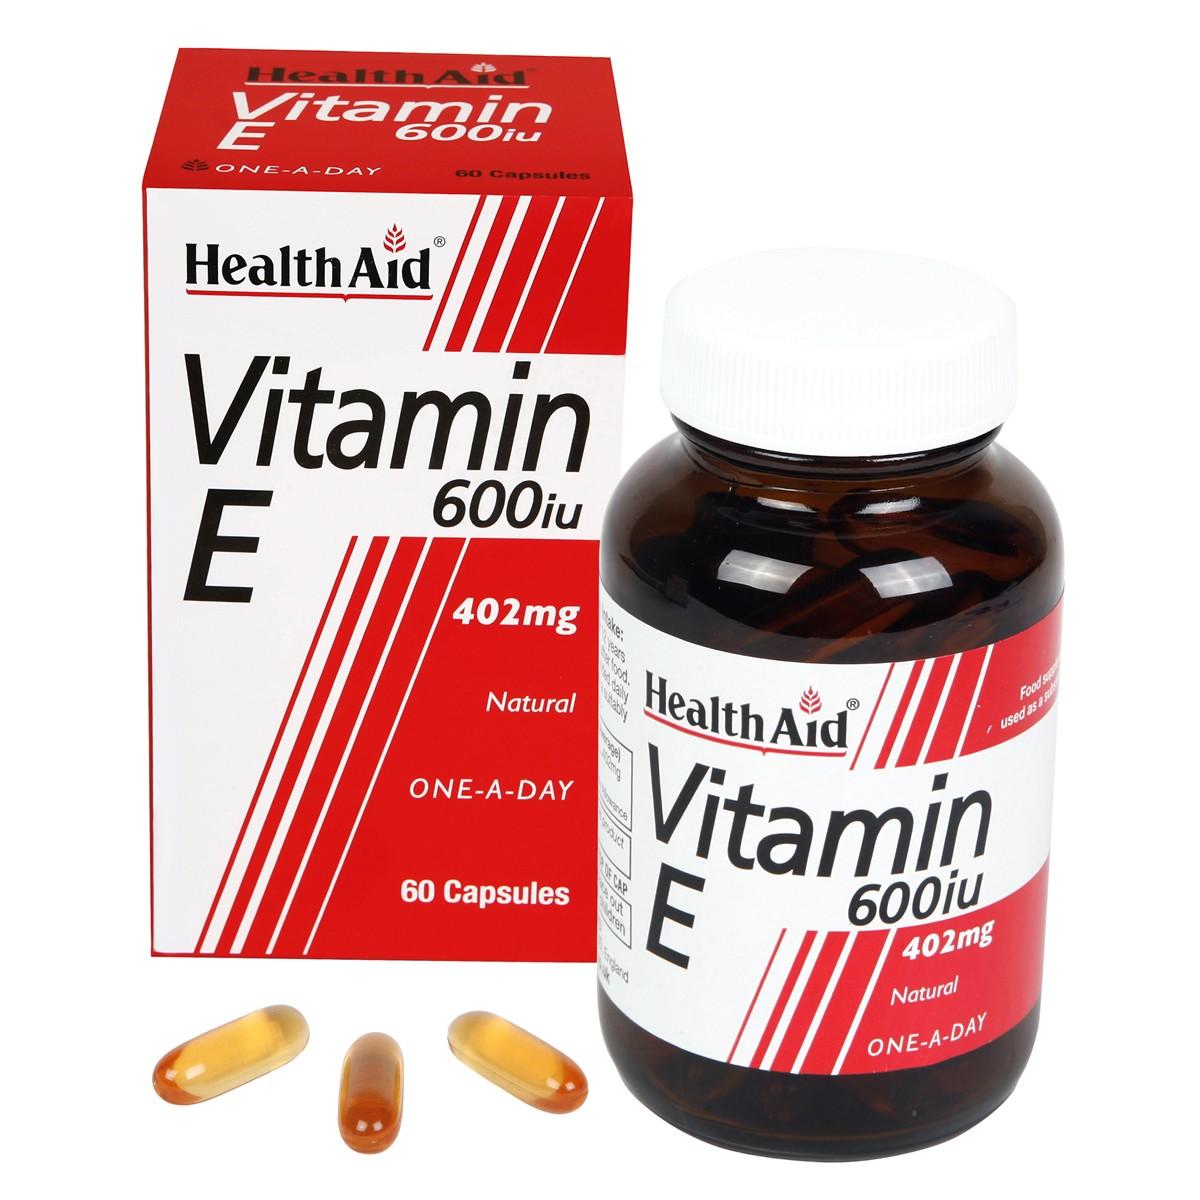 HealthAid Vitamin E 600iu Natural Capsules